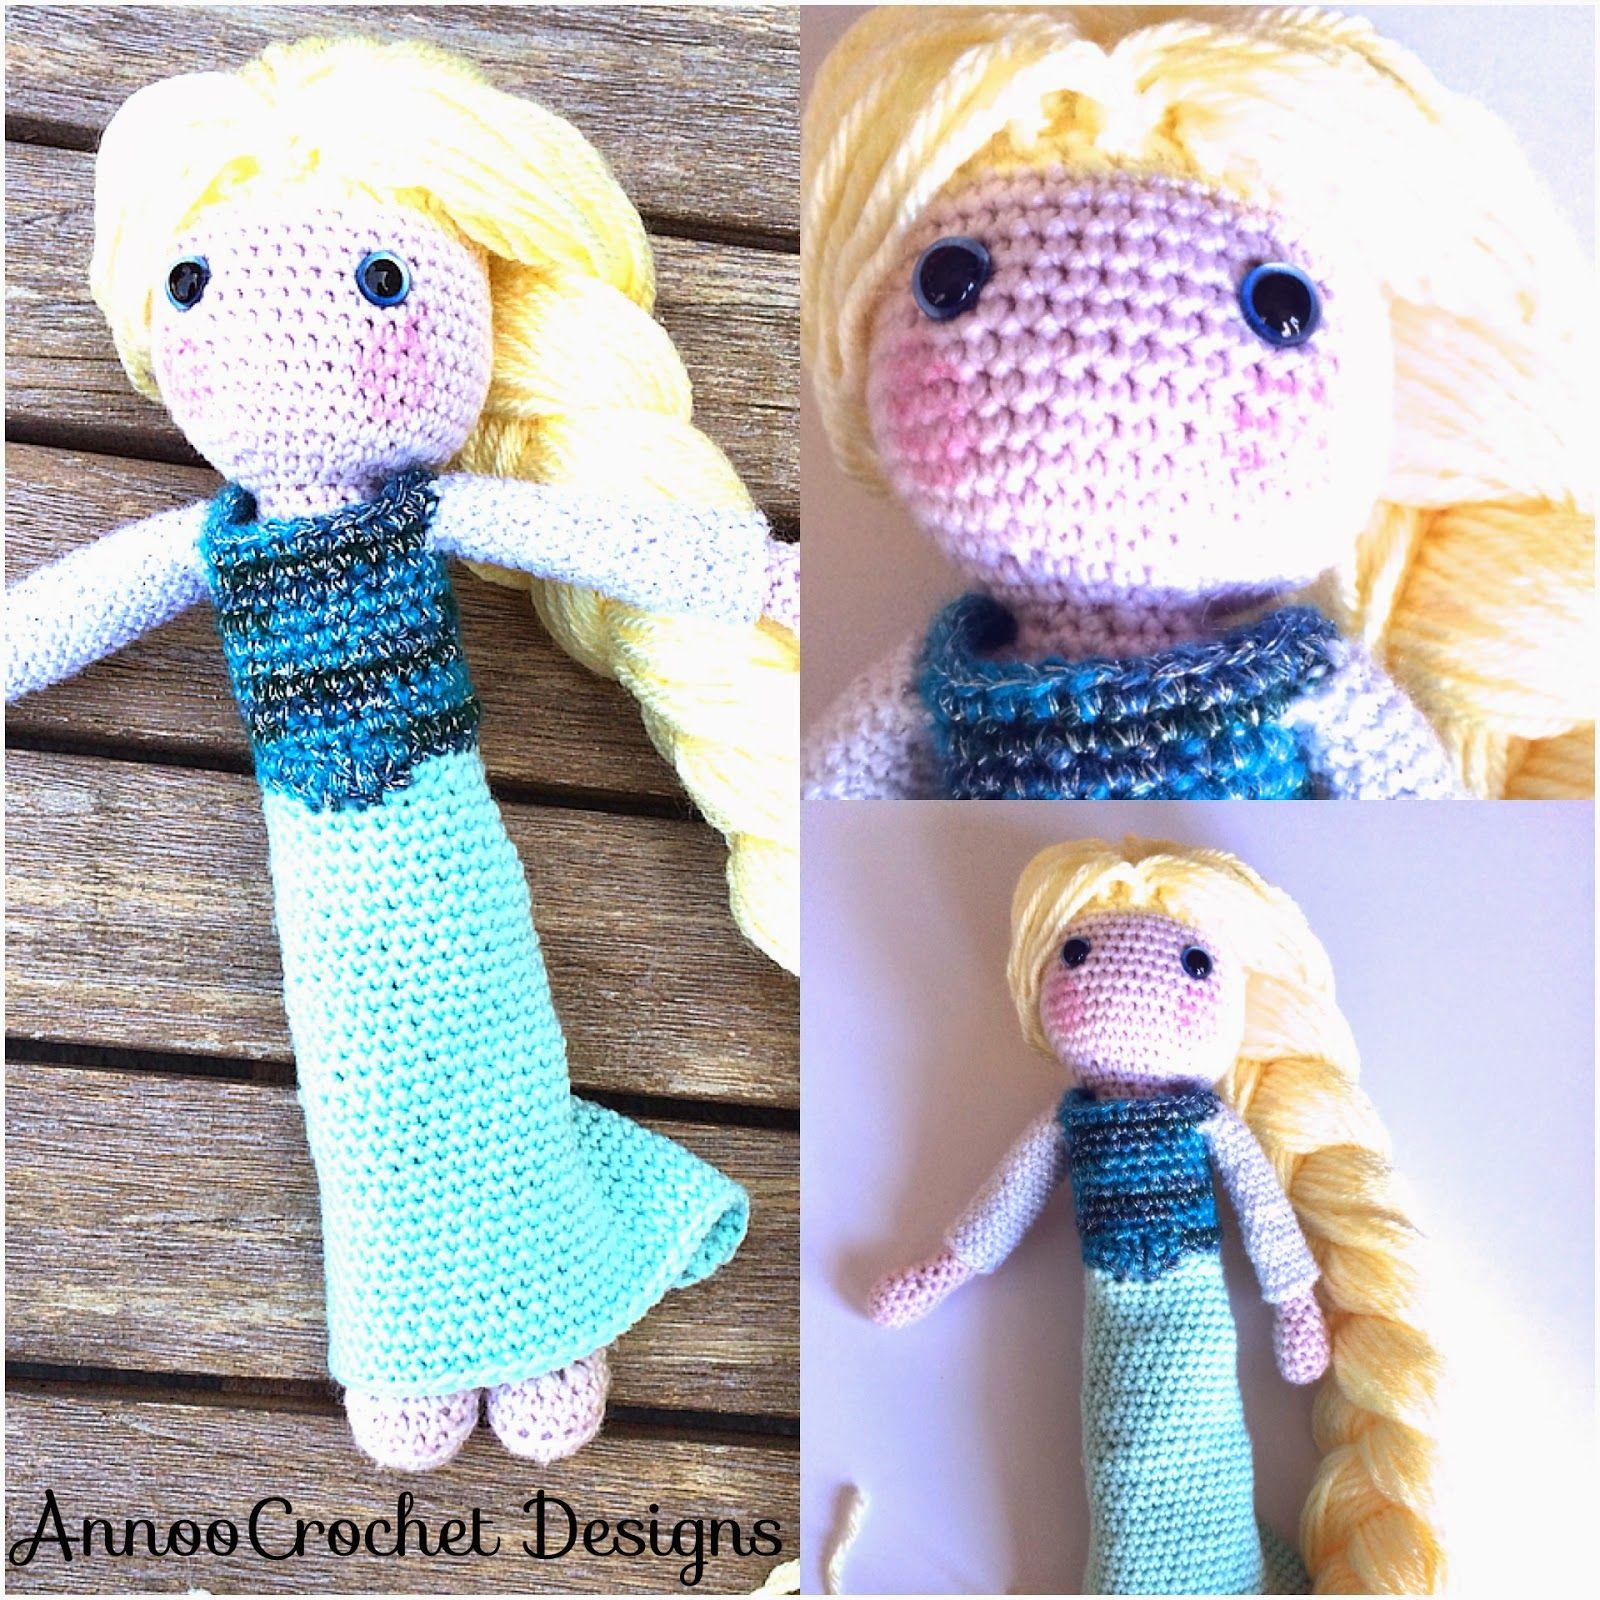 Crochet Elsa Doll Free : Elsa Crochet Doll Free Tutorial - Free Crochet Pattern ...